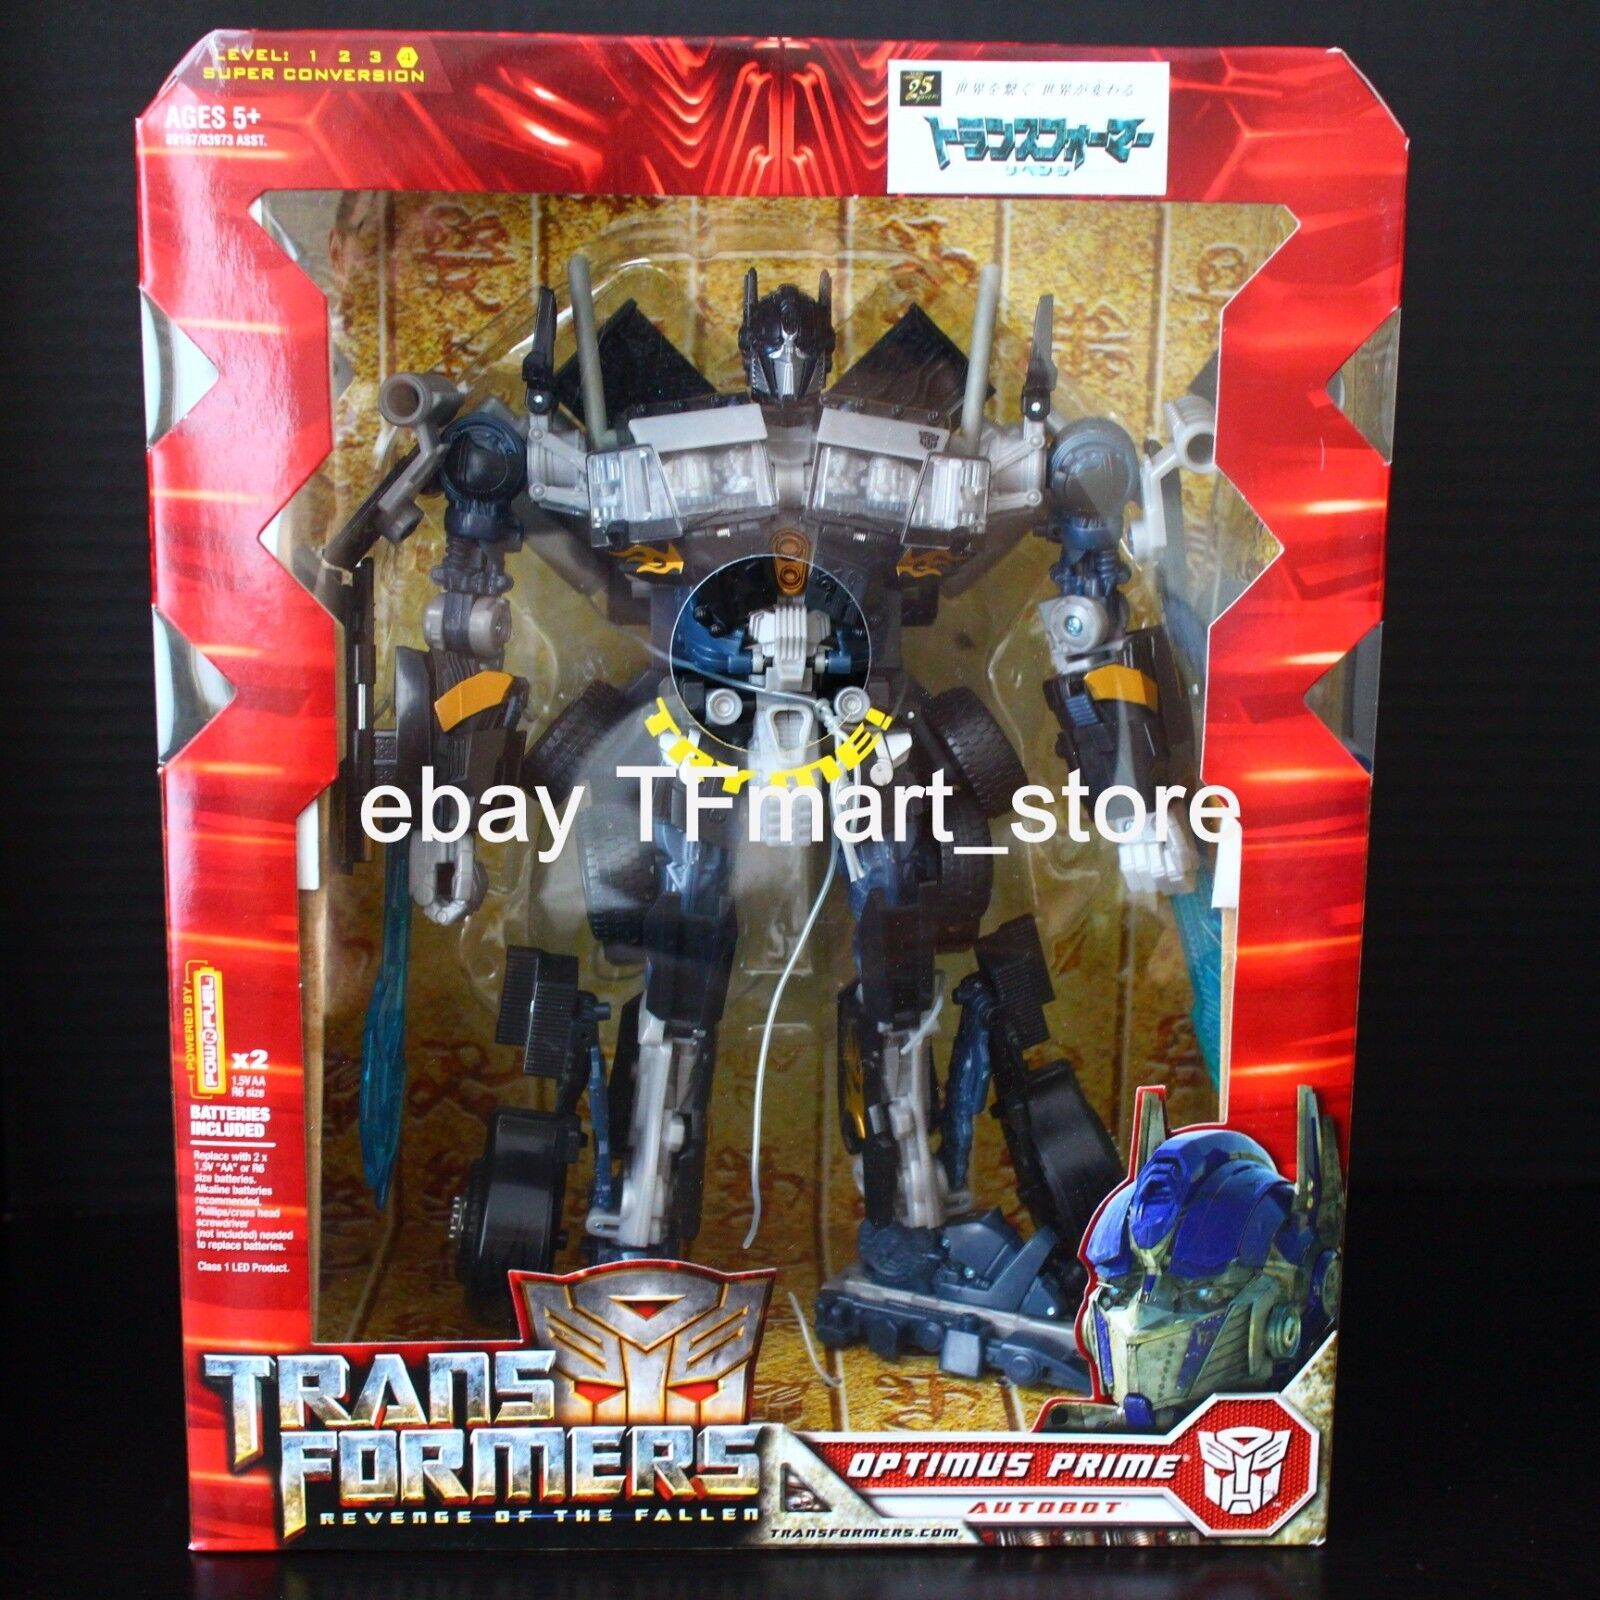 Echt Takara Transformers Amazon Japan Exkl. redf black Optimus Prime Konvoi